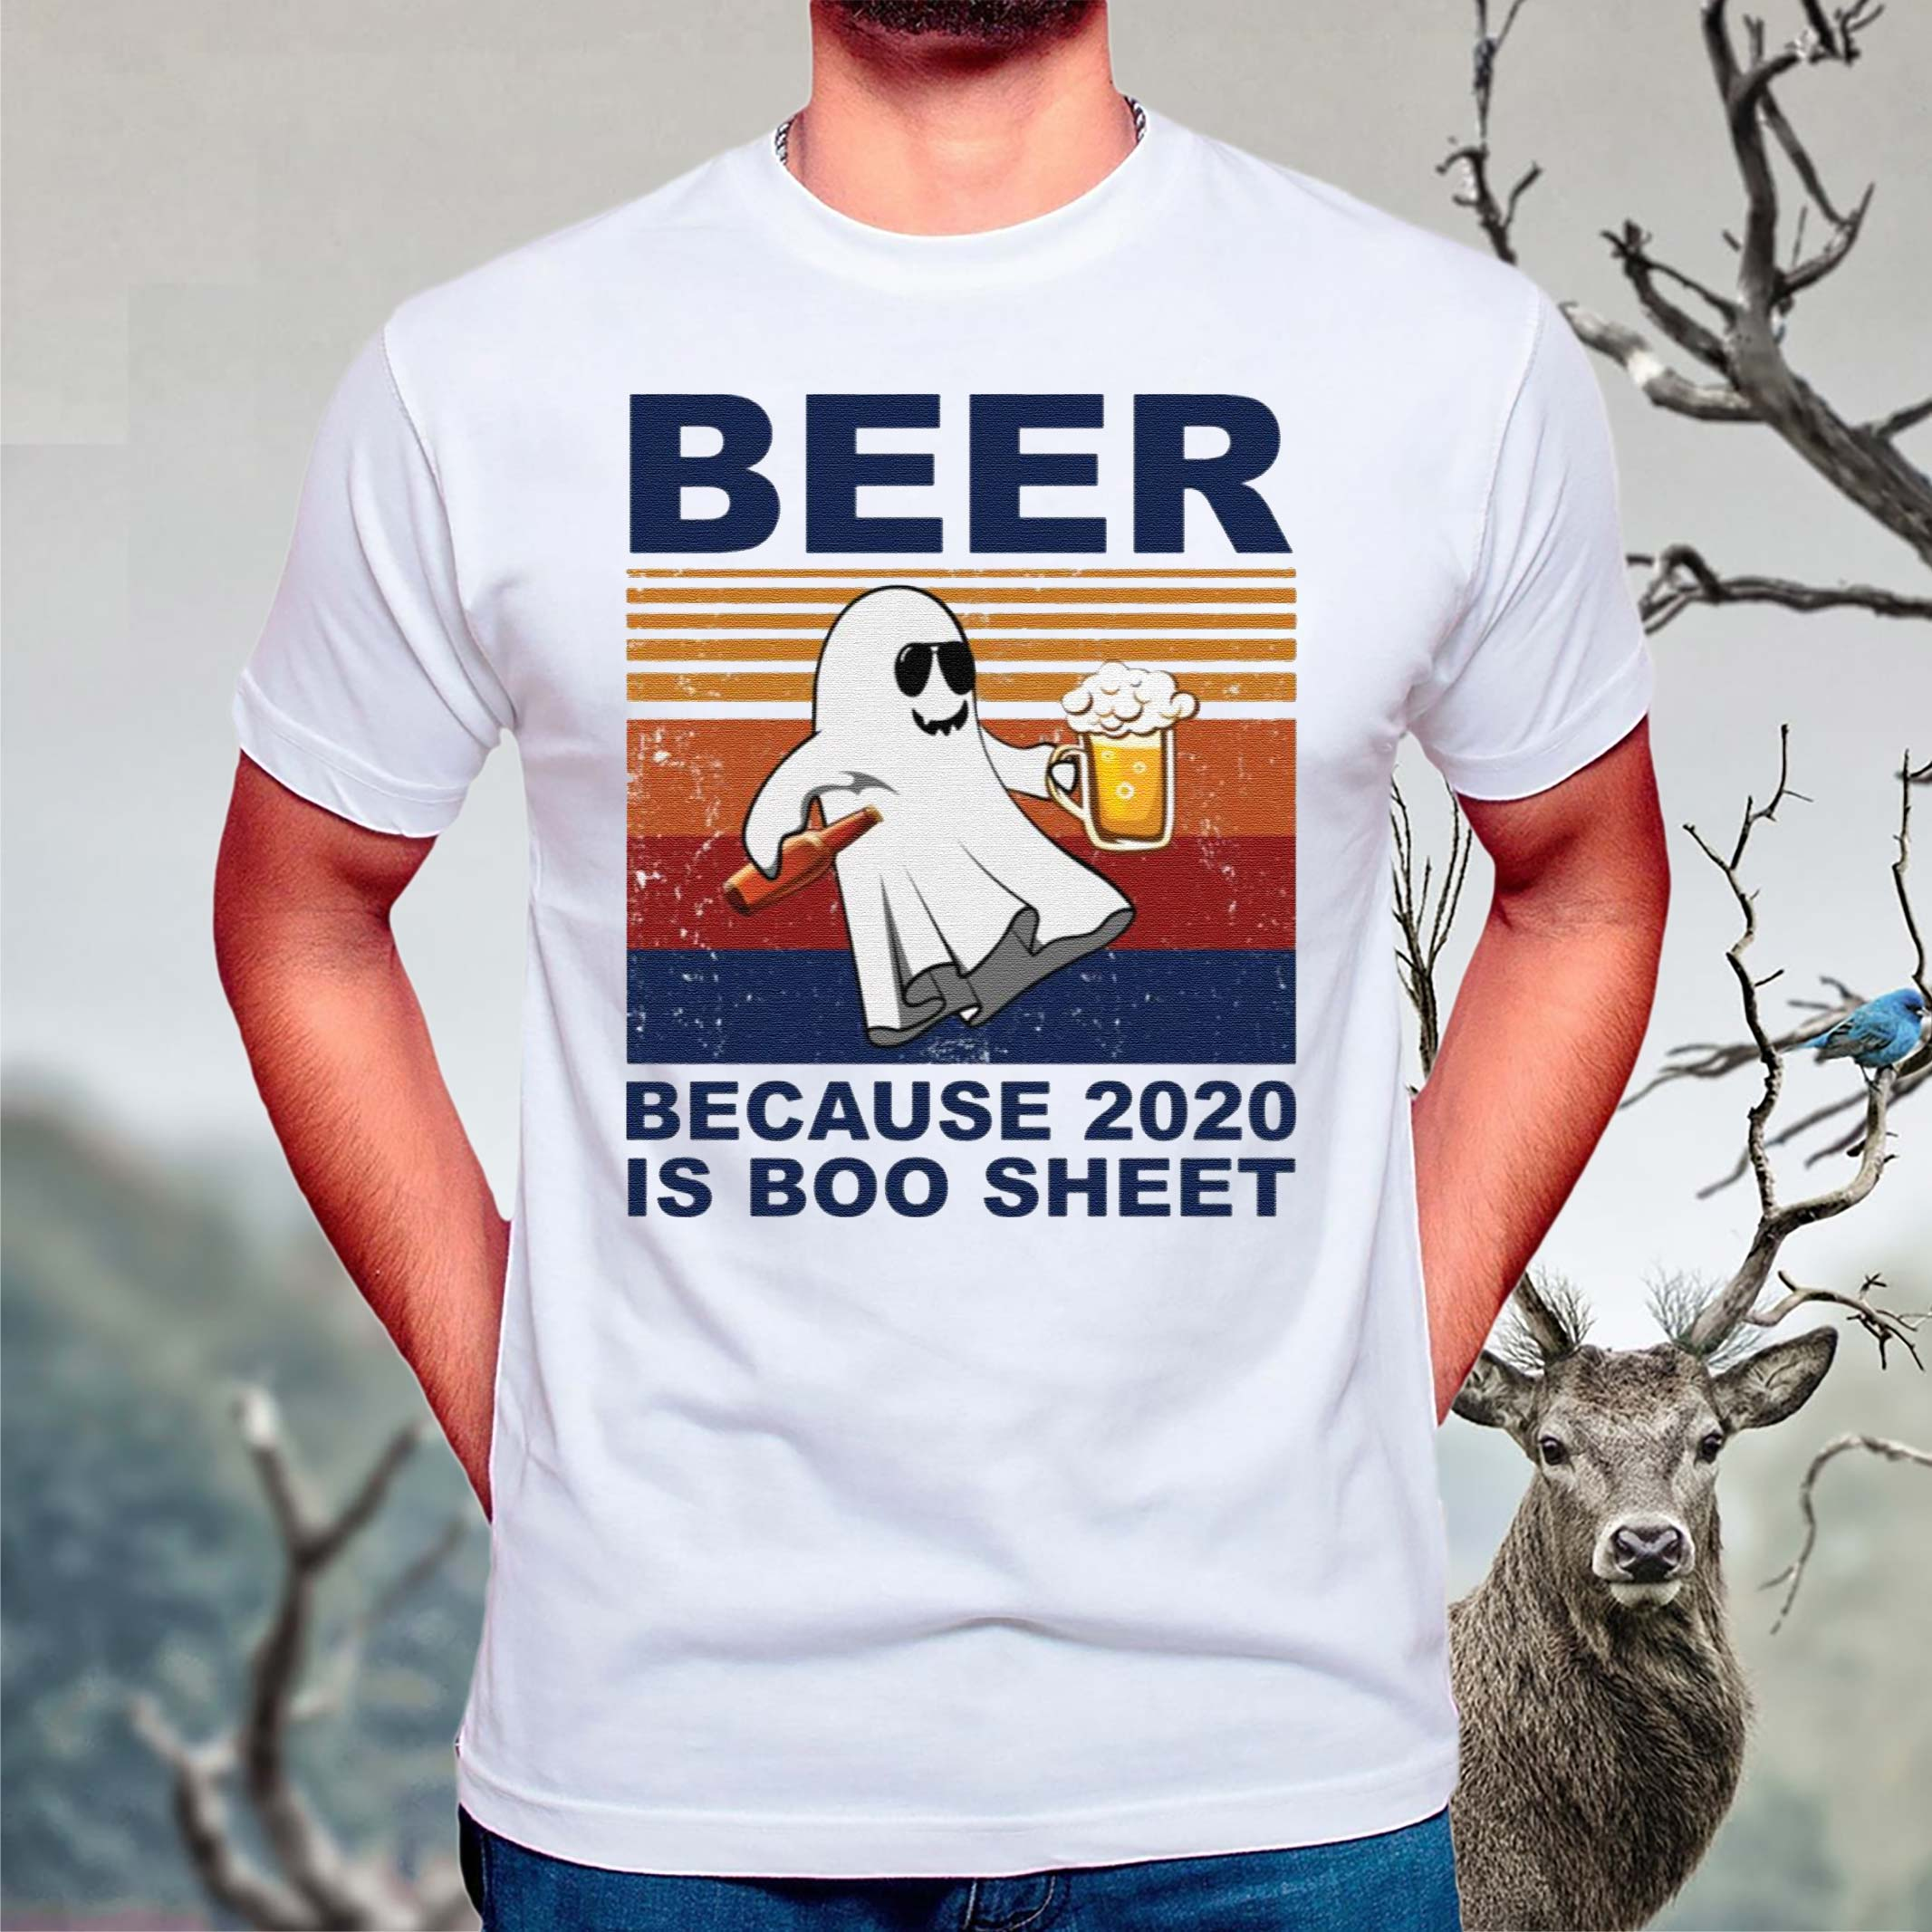 Beer-because-2020-is-boo-sheet-shirt